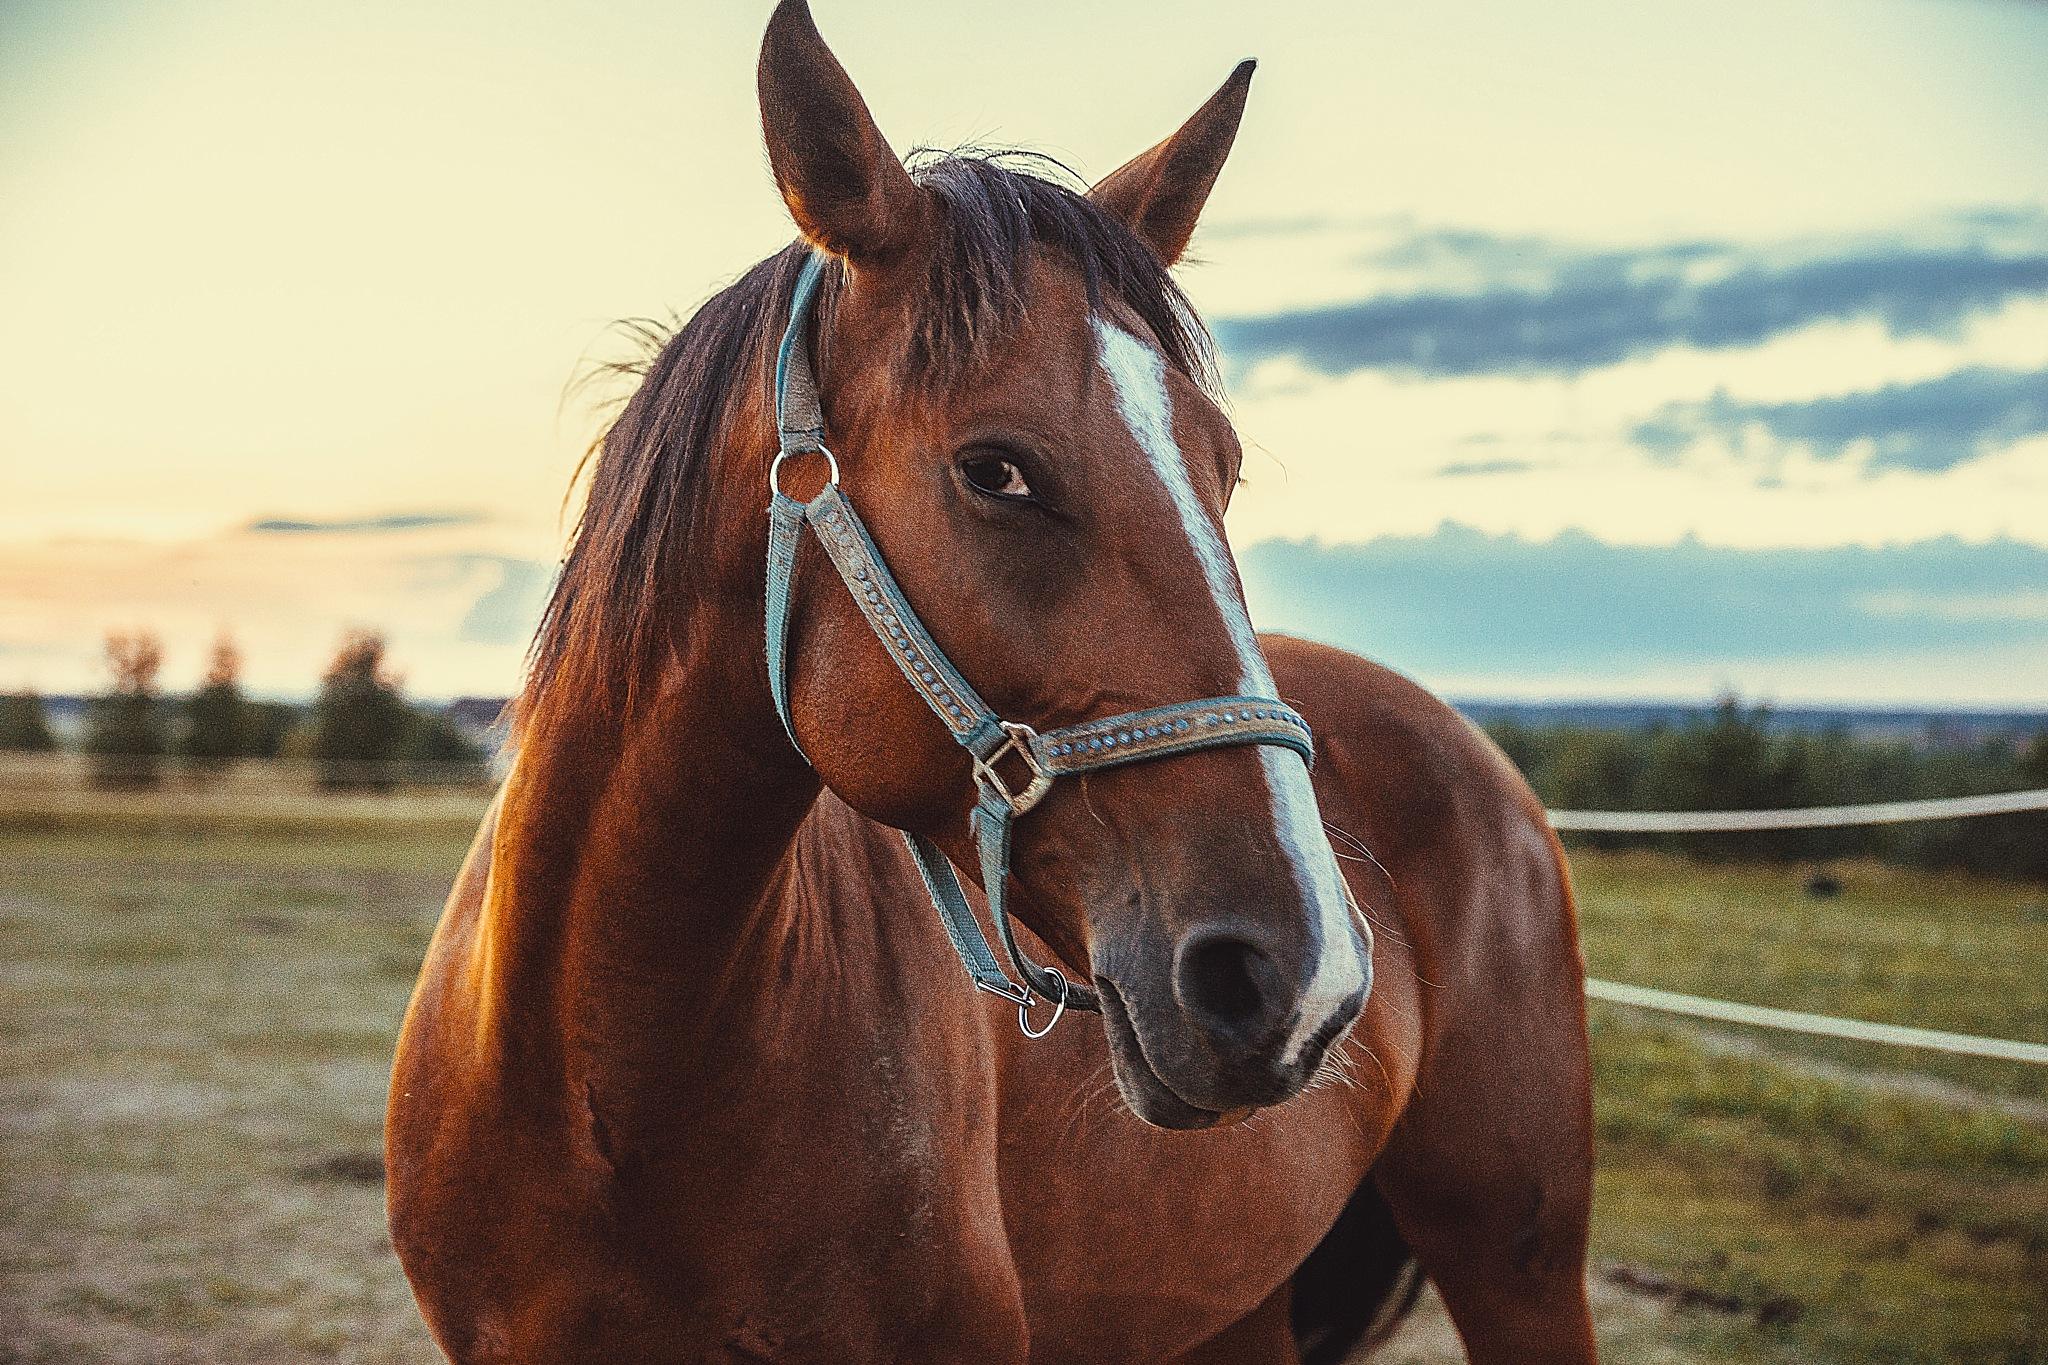 Horse by Daria Klepikova